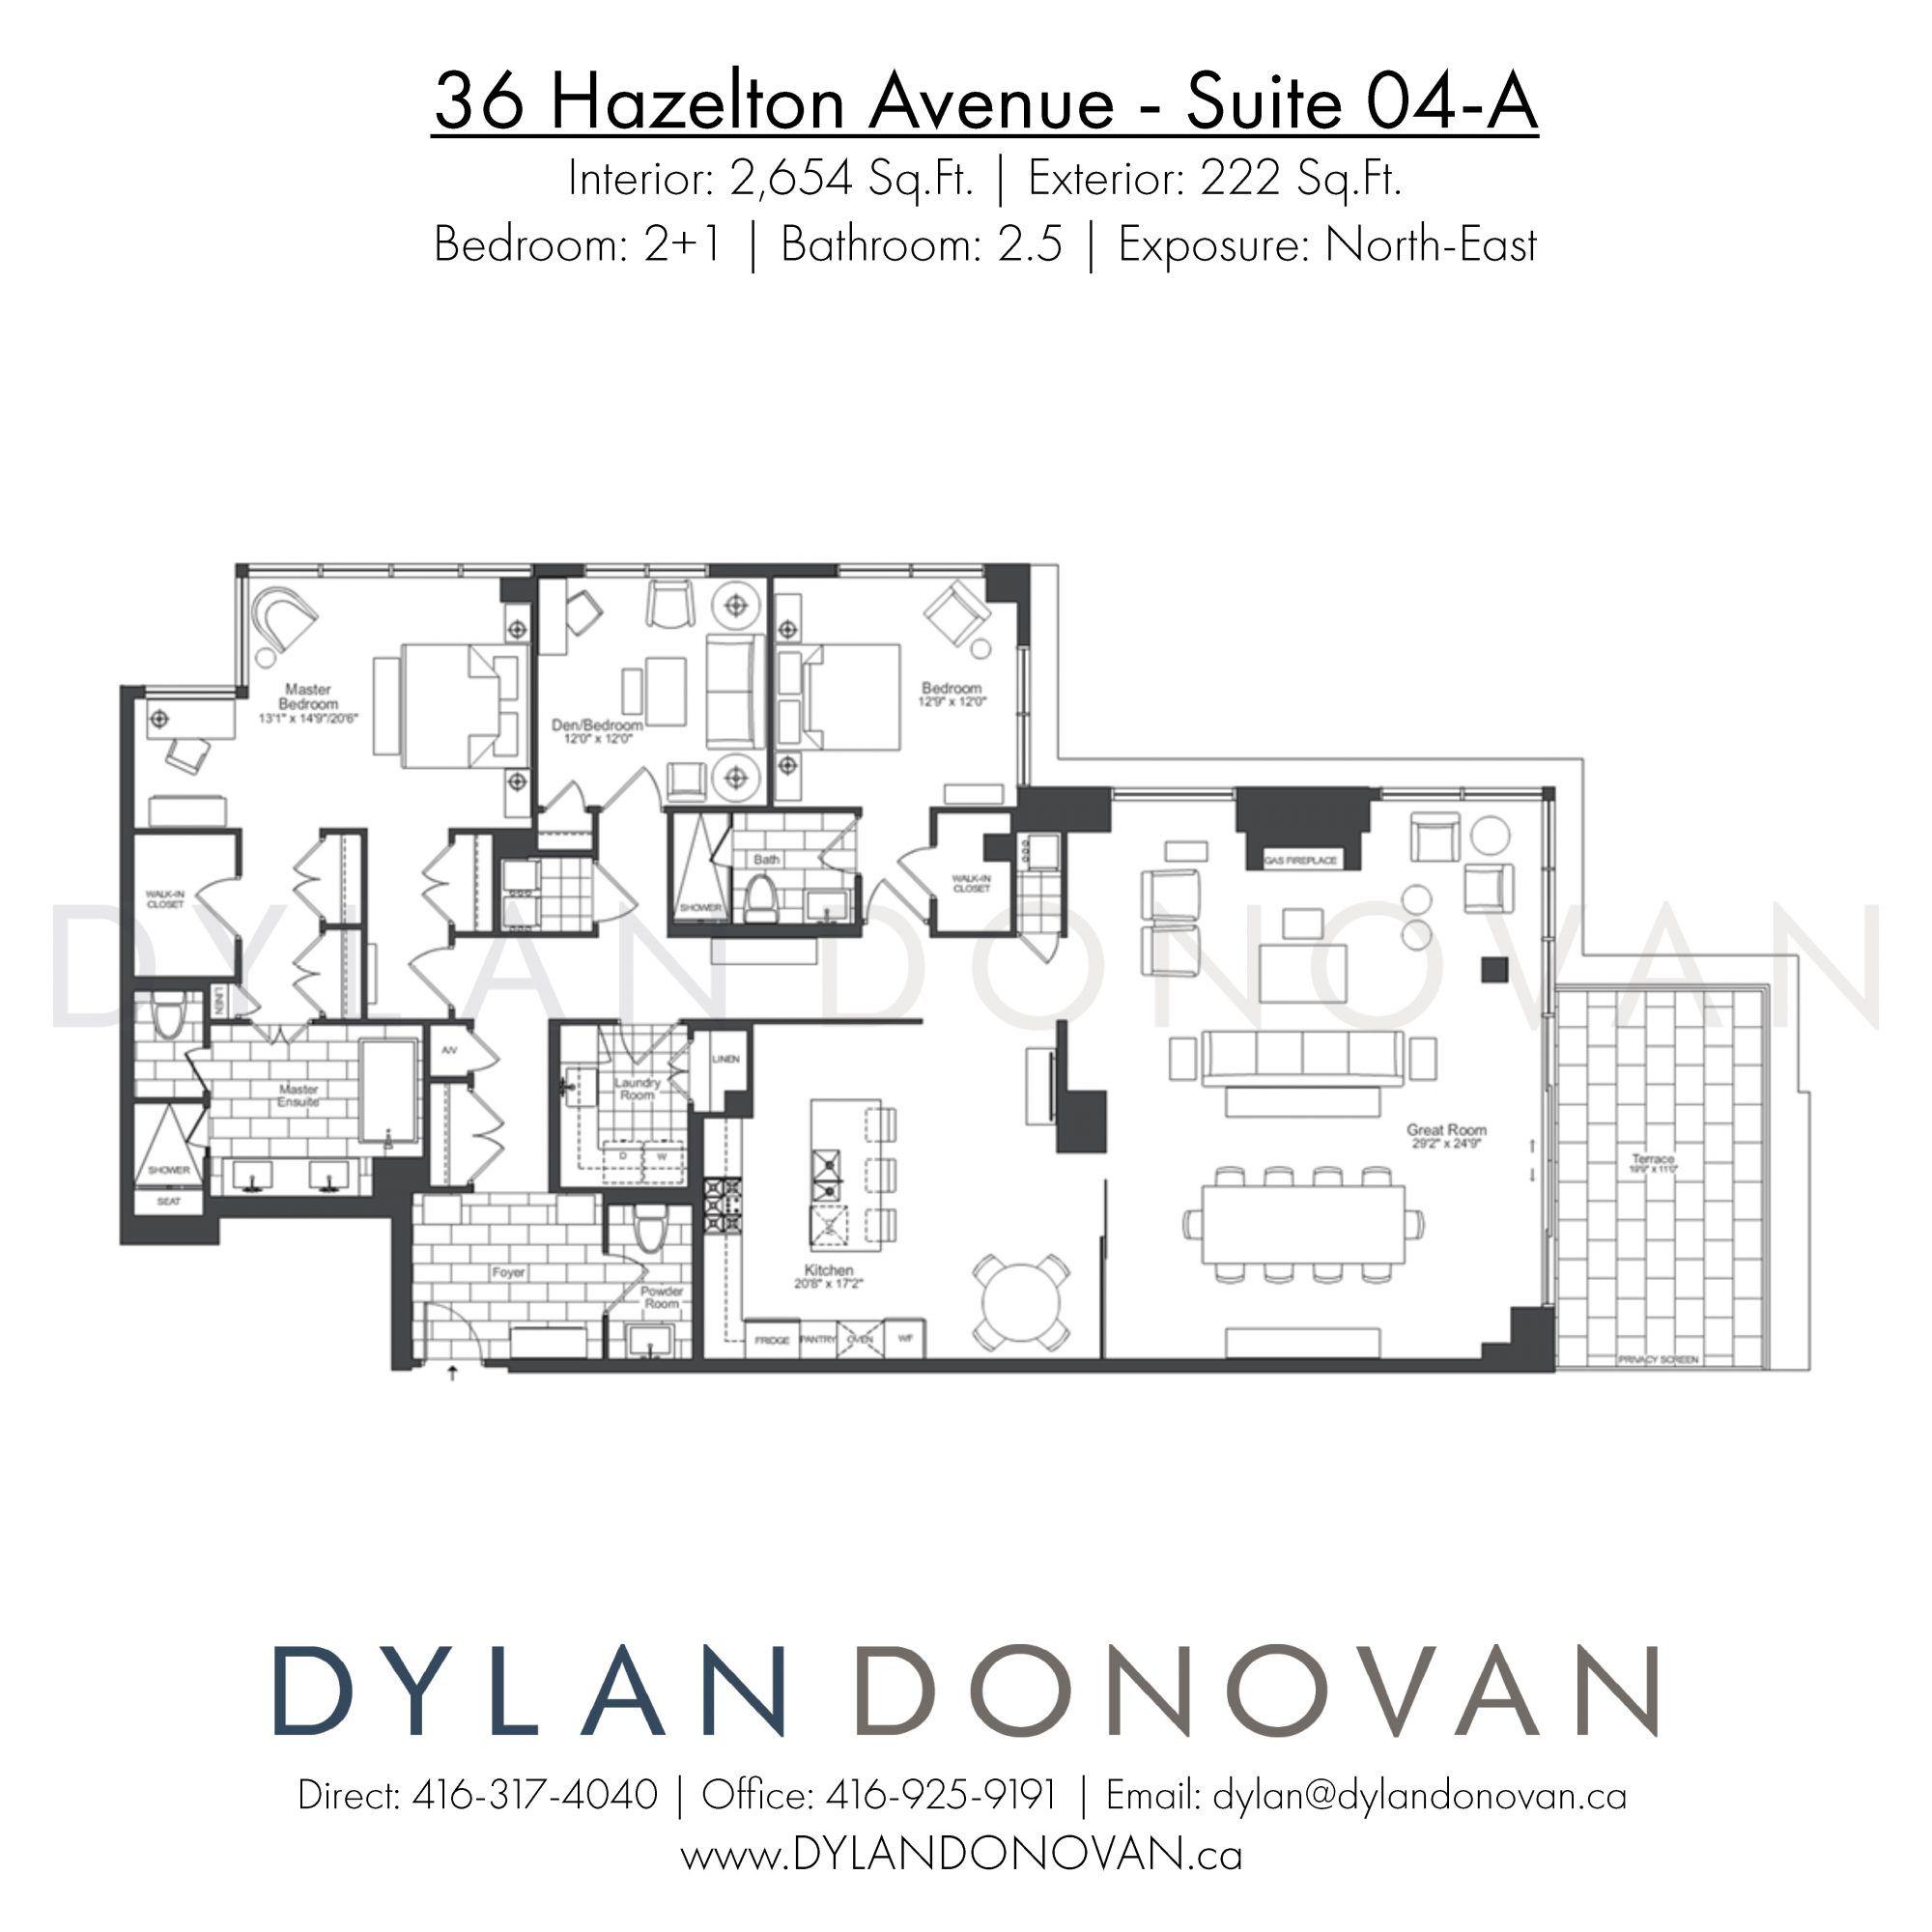 36 Hazelton Avenue Floor Plans View All Toronto Condos Floor Plans Flooring Sale Luxury Condo